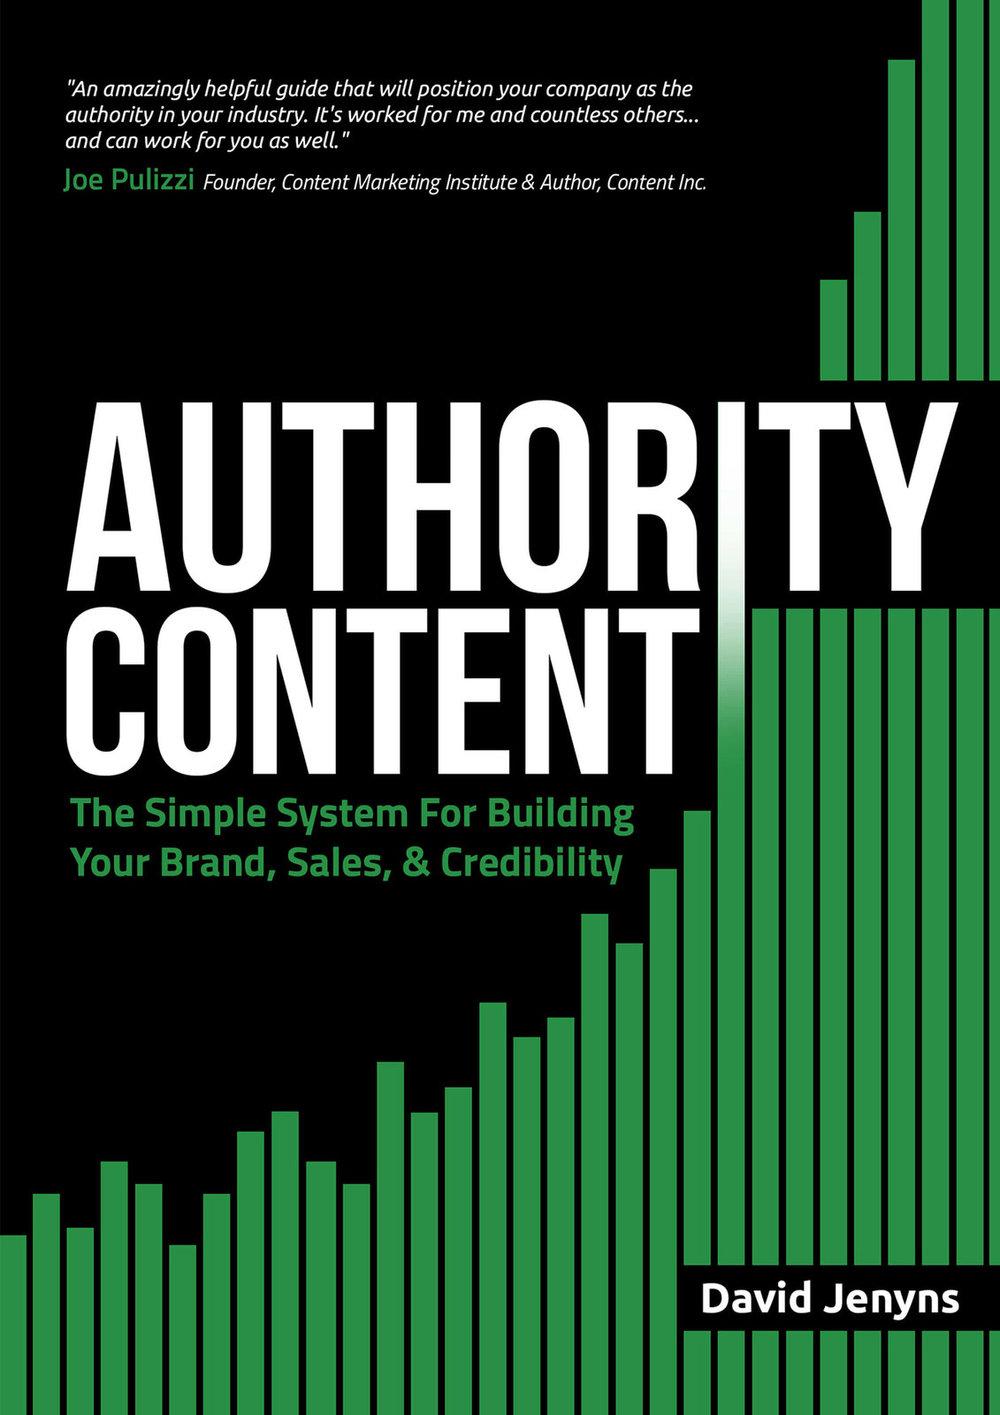 David-Jenyns-Authority-Content.jpg